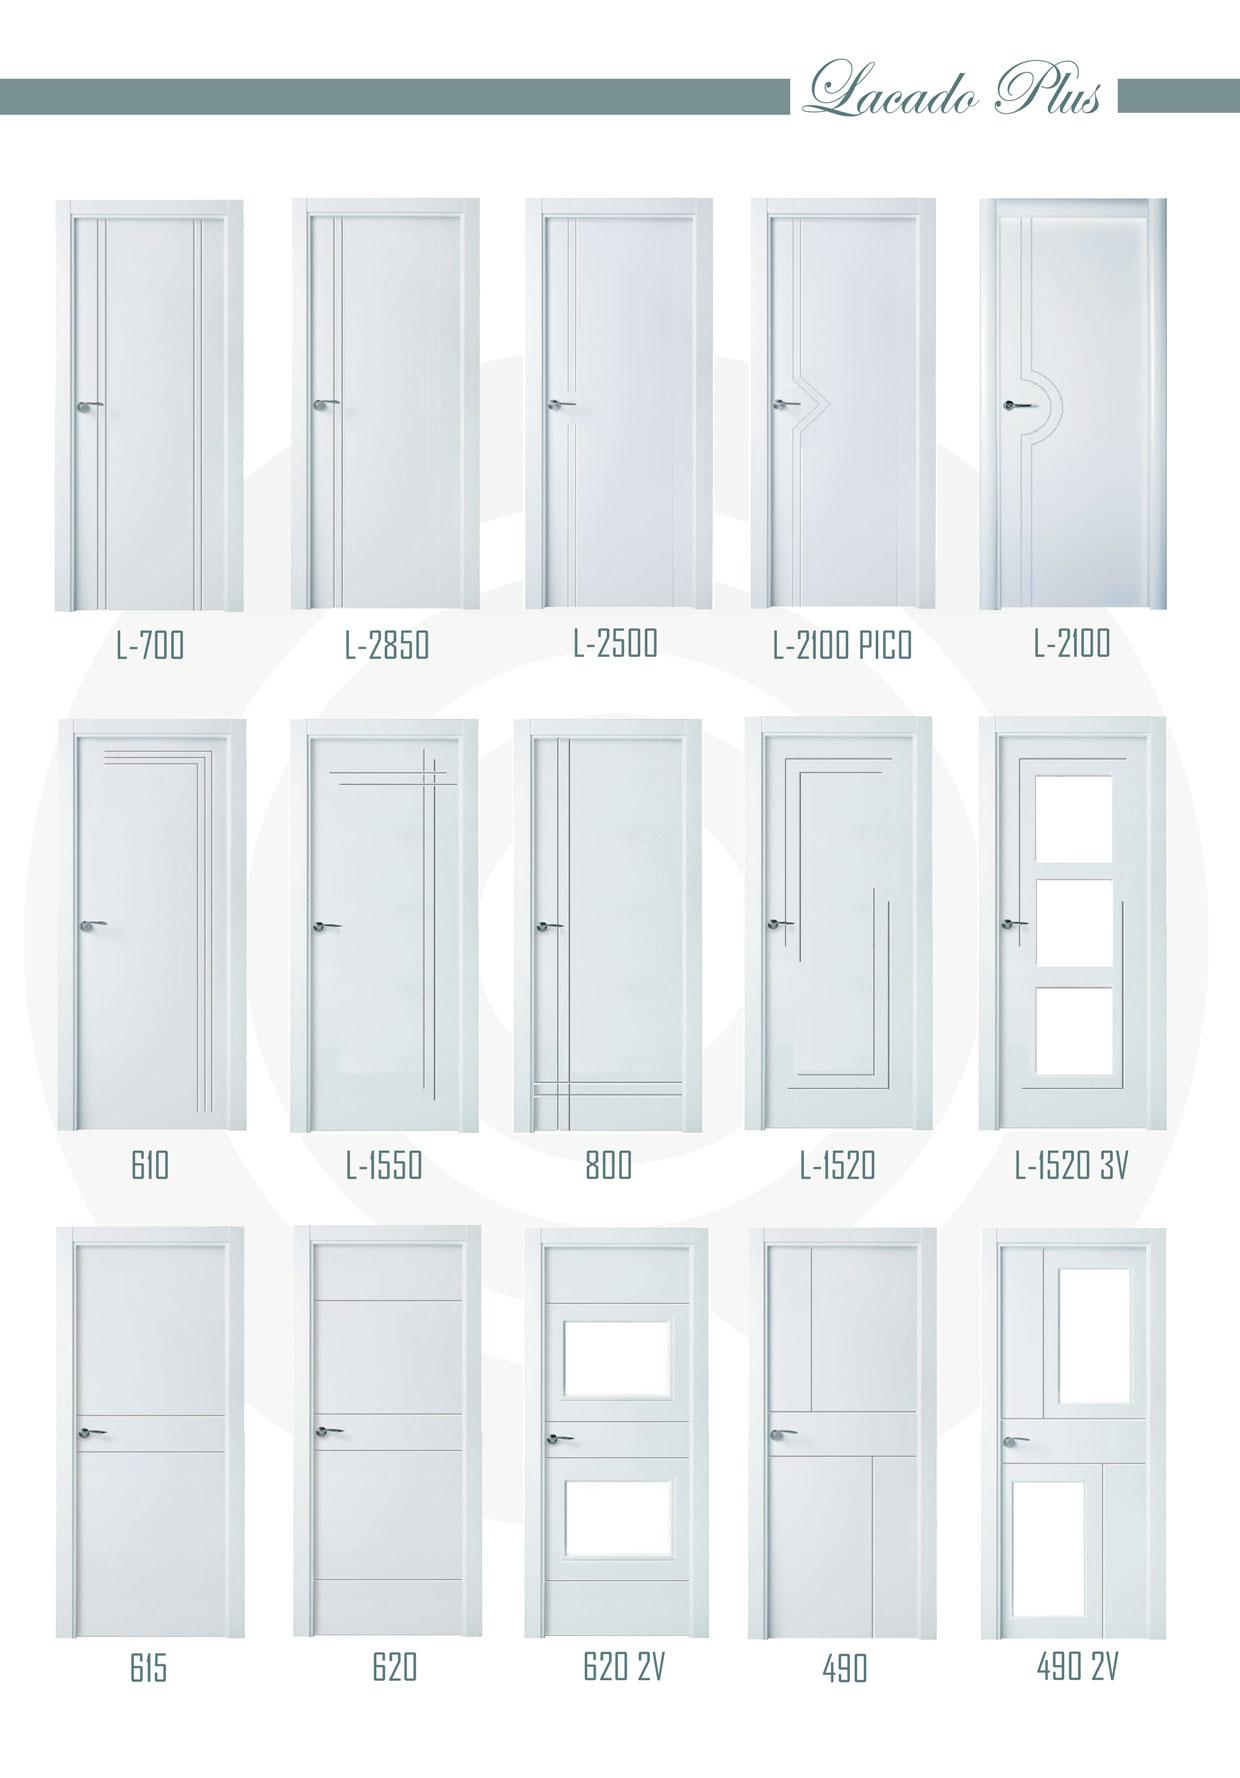 Catalogo puertas lacadas